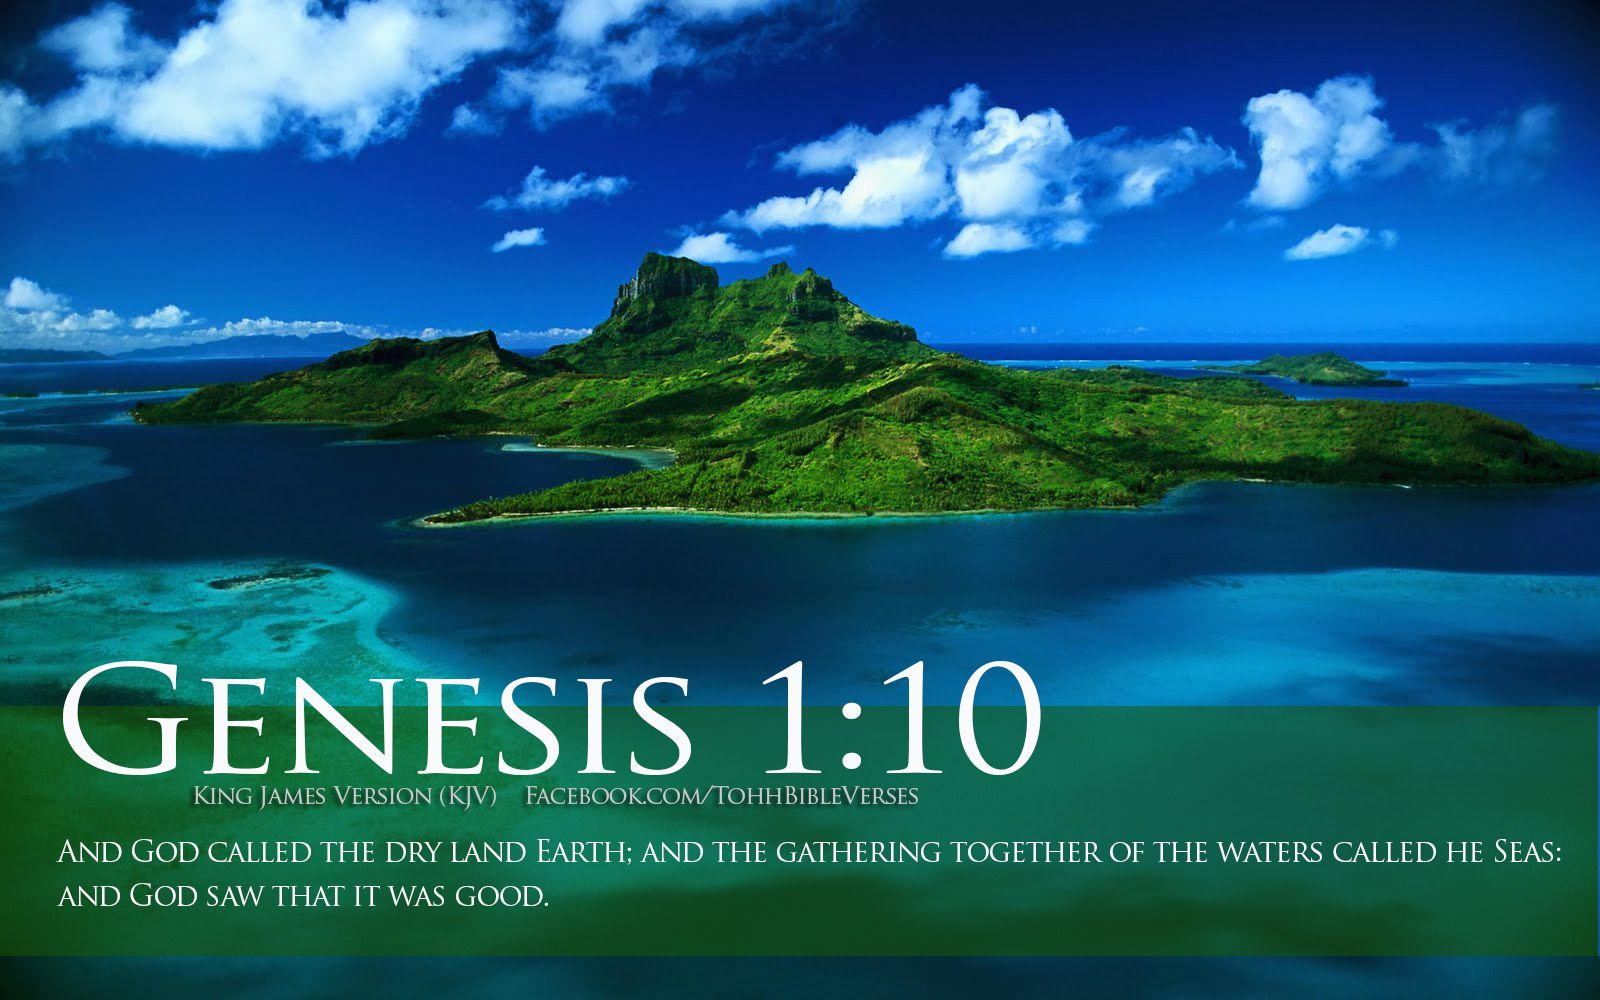 beautiful verses in the bible Bible Verses Genesis 110